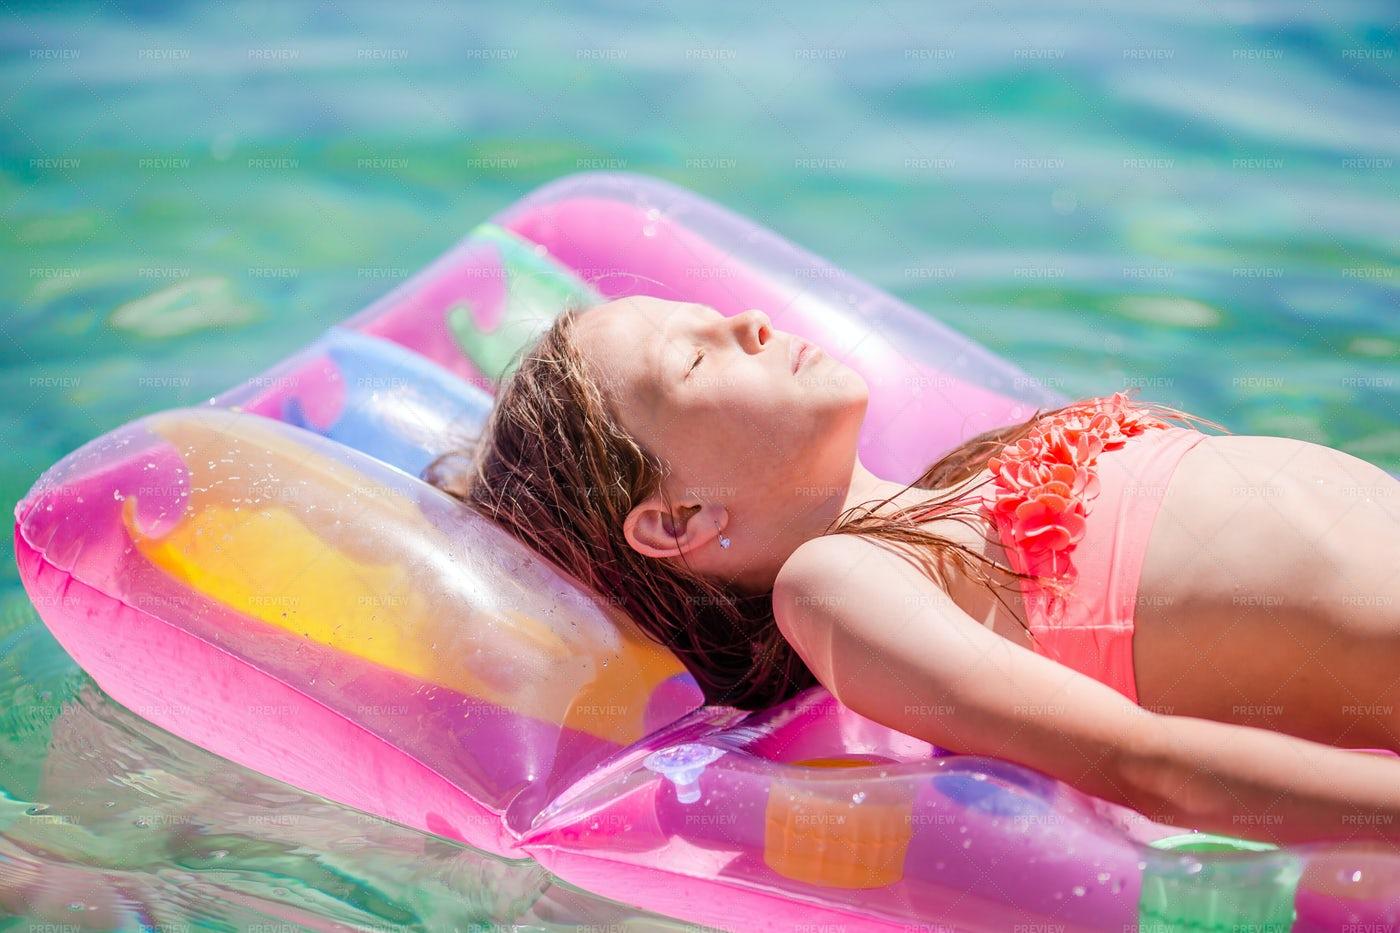 Sunbathing On Inflatable Air Mattress: Stock Photos